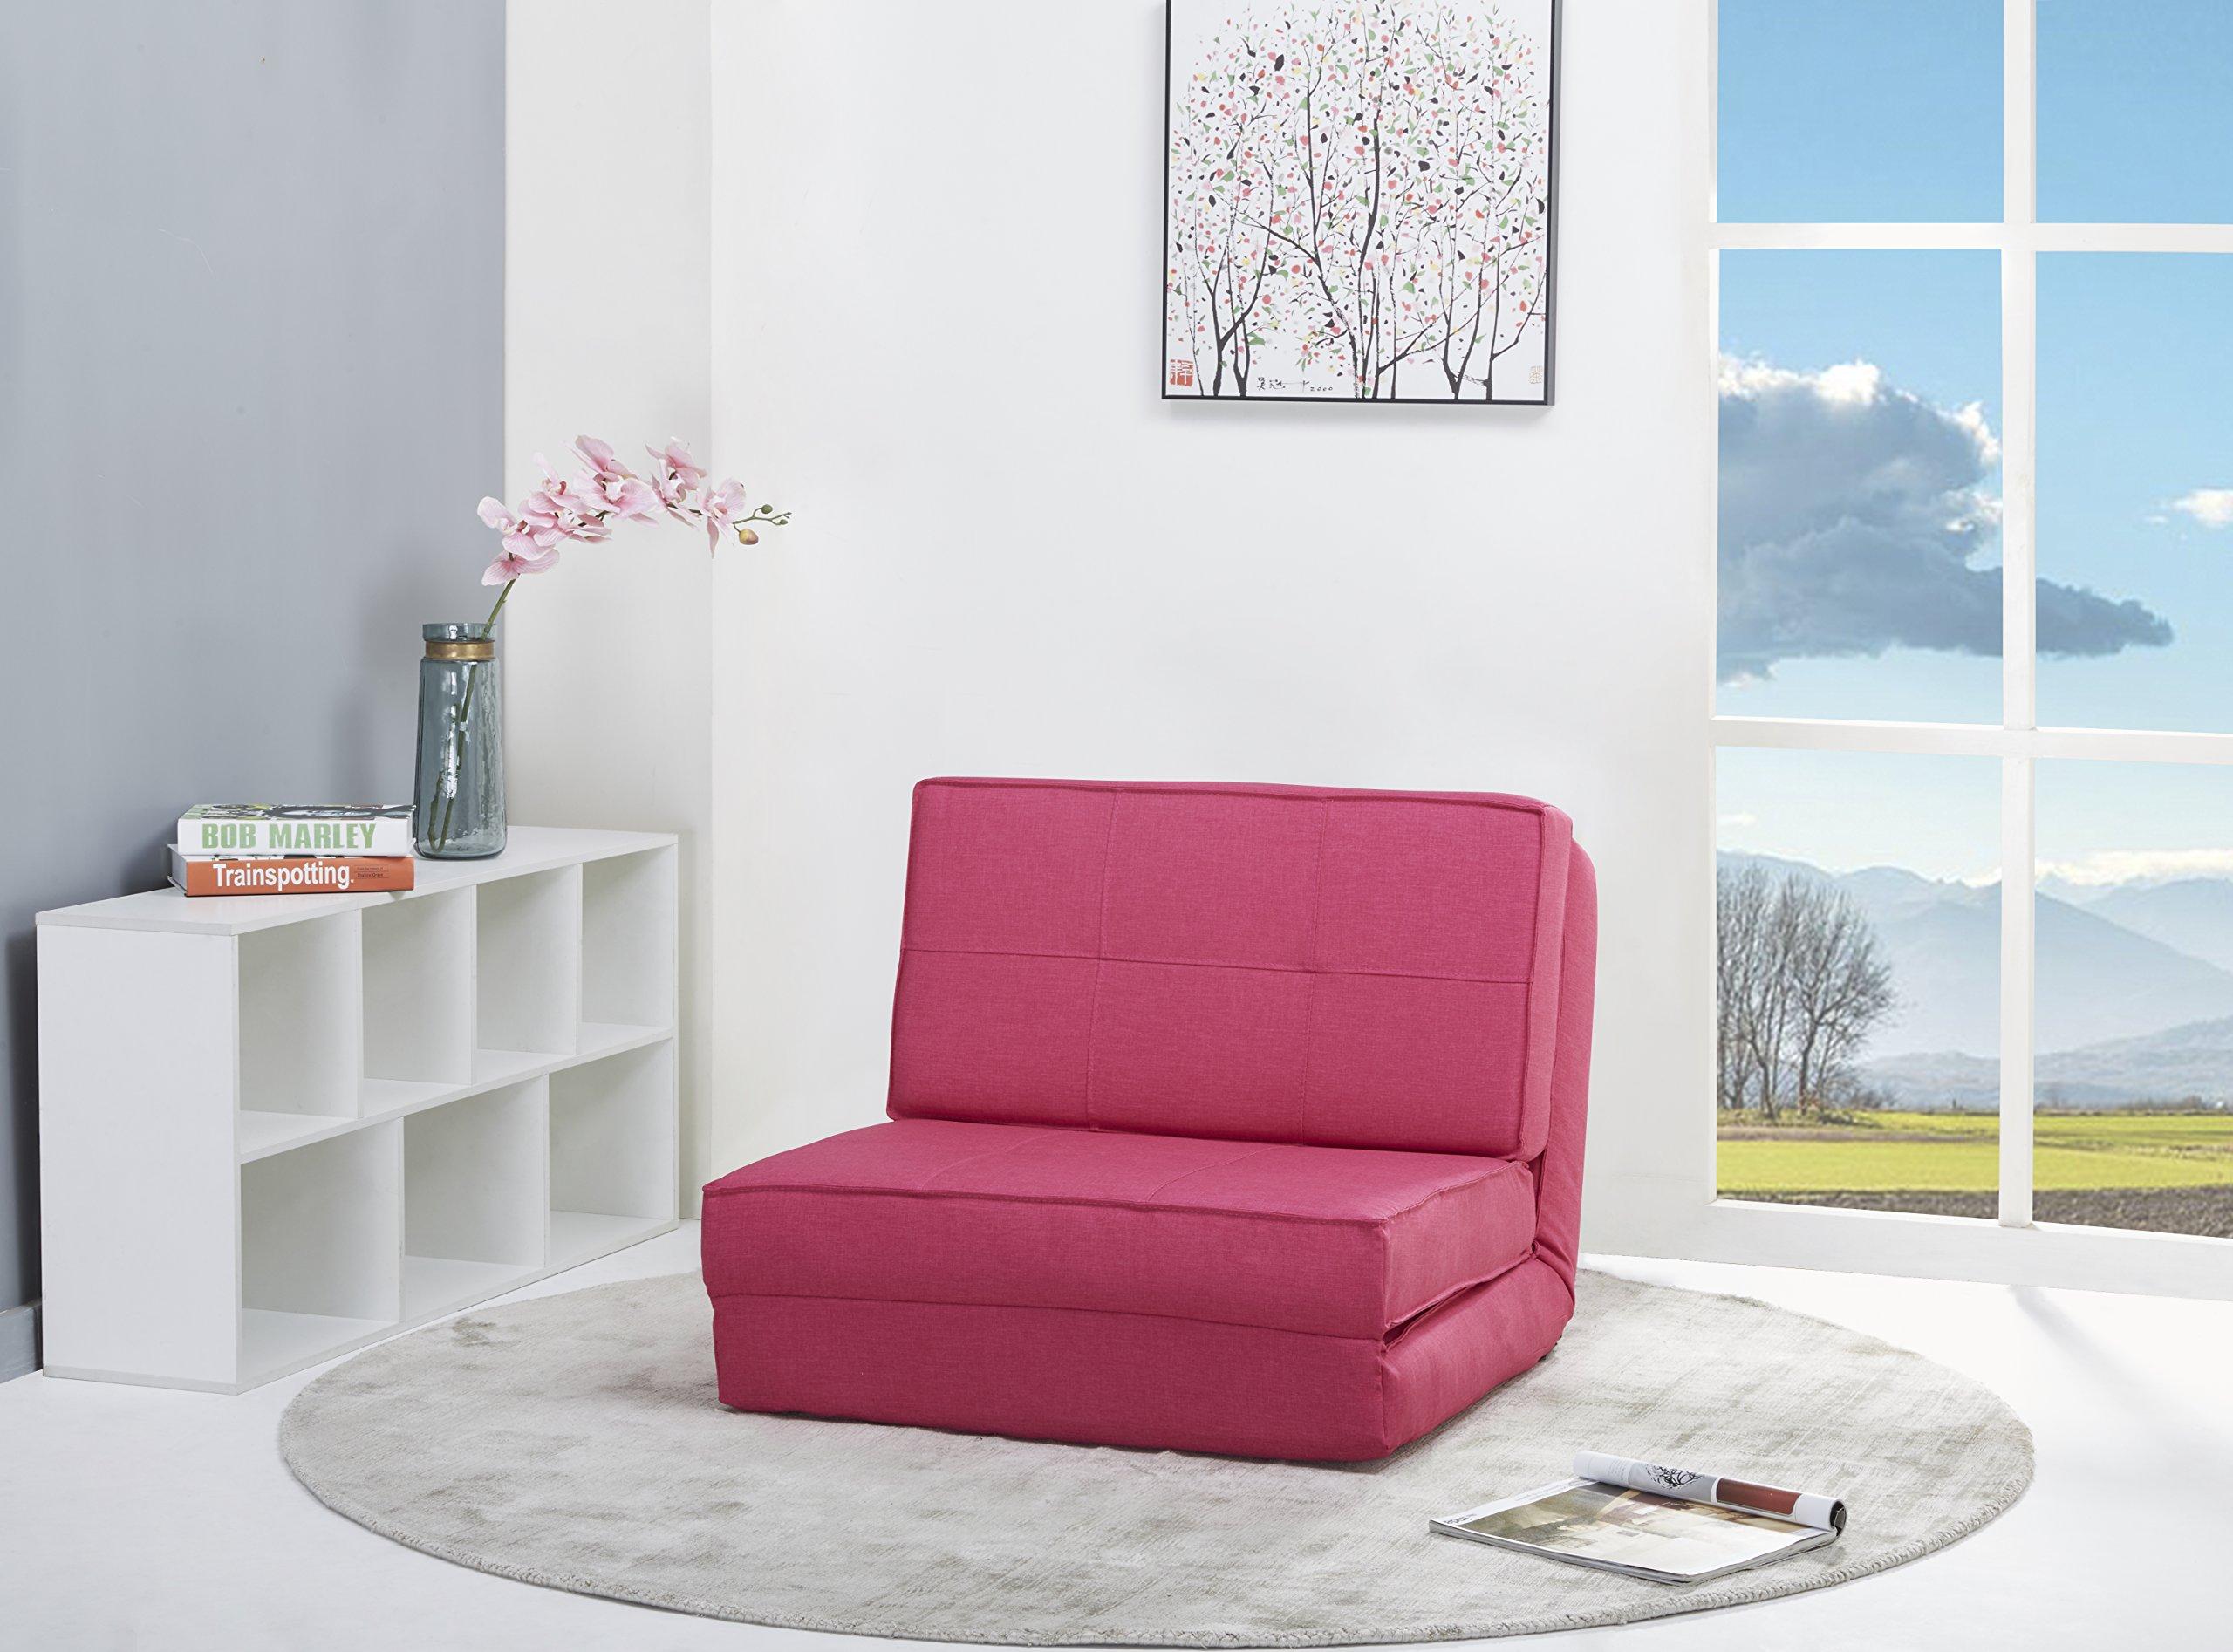 Sillón cama funda de tela rosa pequeño product image